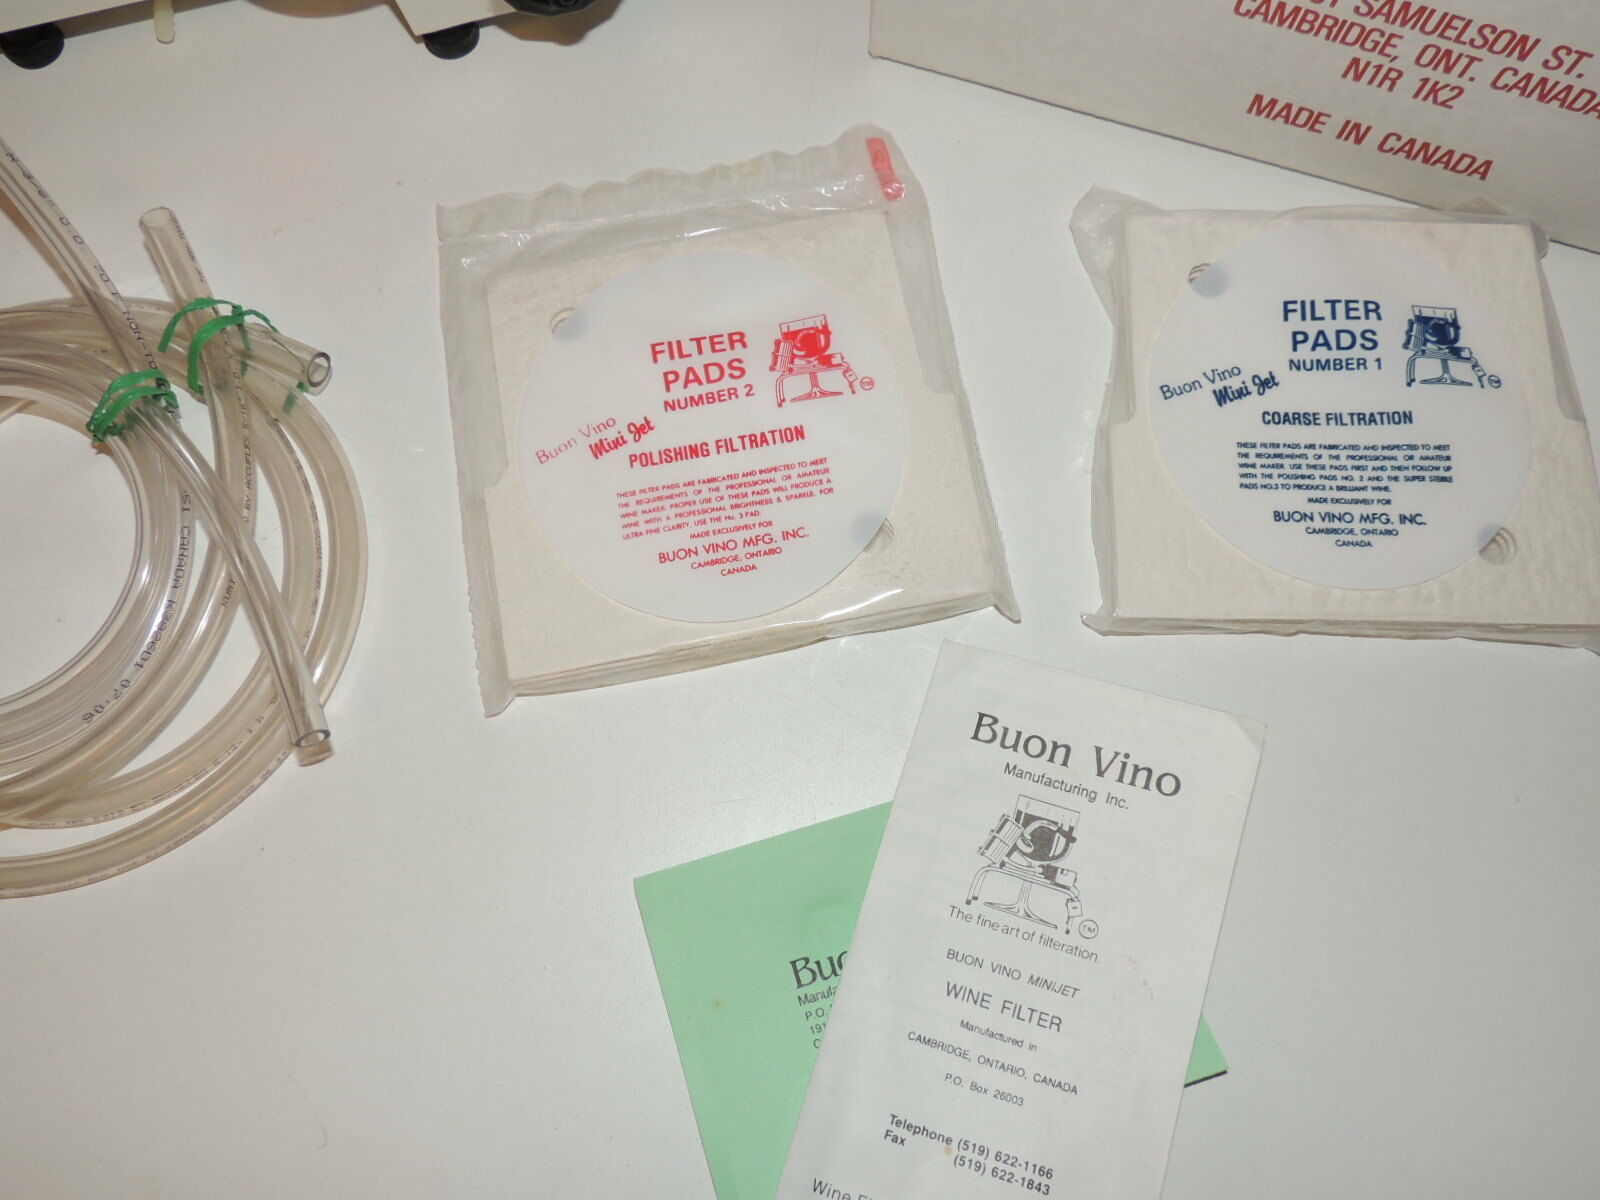 BUON VINO MINI-JET WINE FILTER Model MJT93089 Used Working w 2 packs Filters image 6